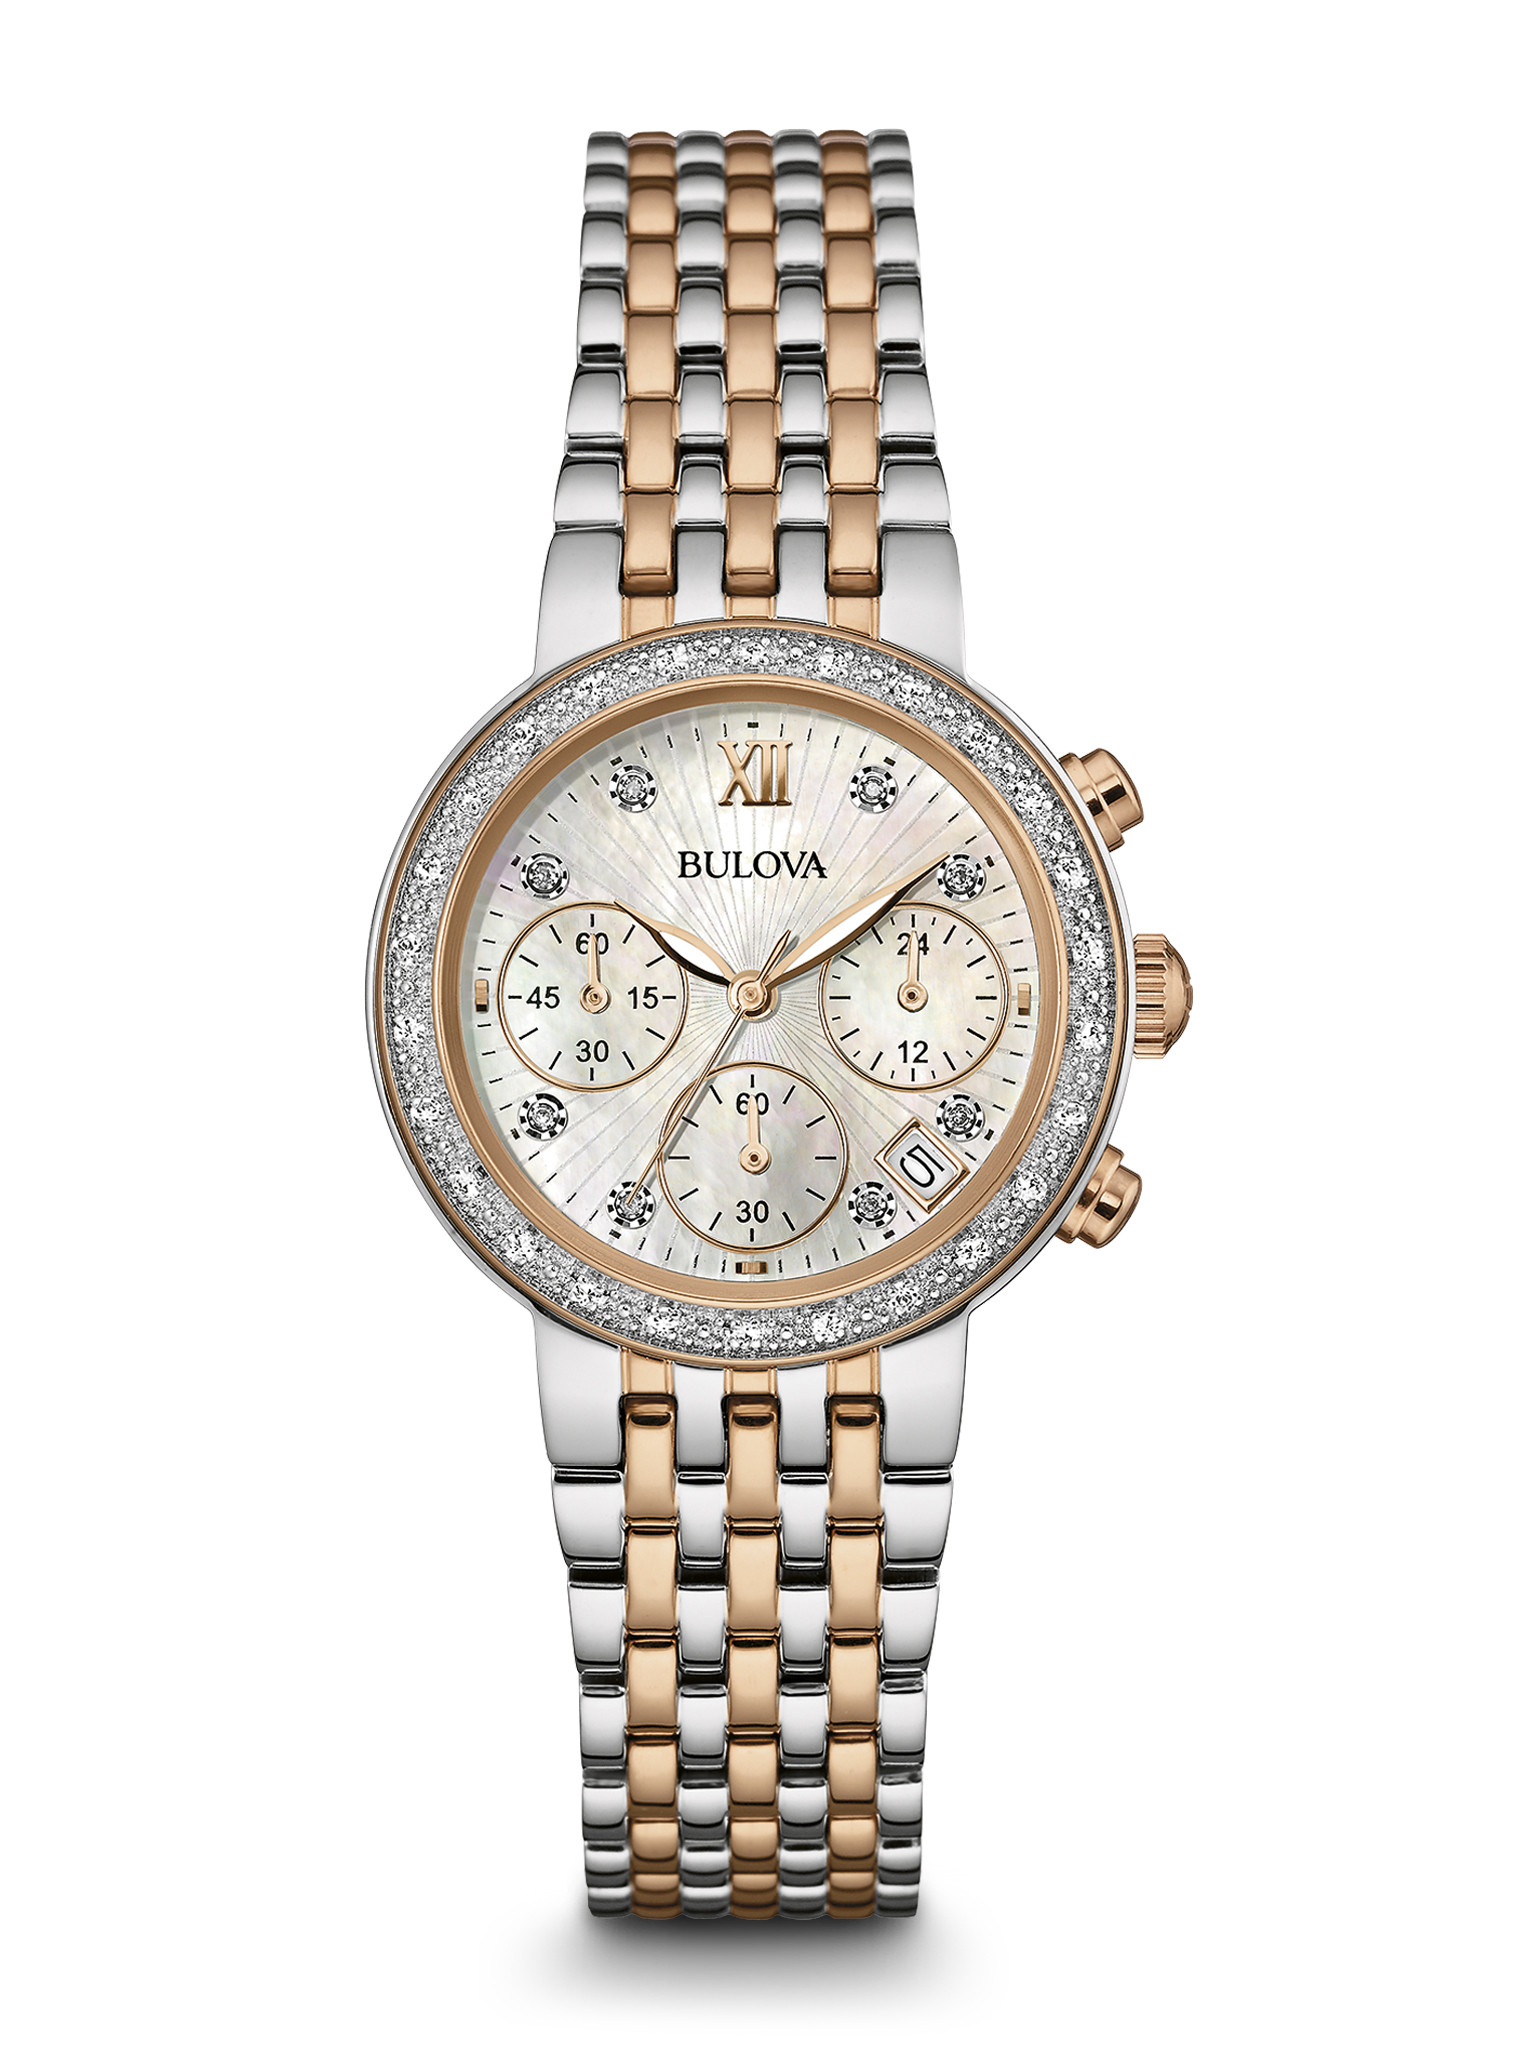 womens-bulova-watch-chronograph-diamond-98r215.jpg